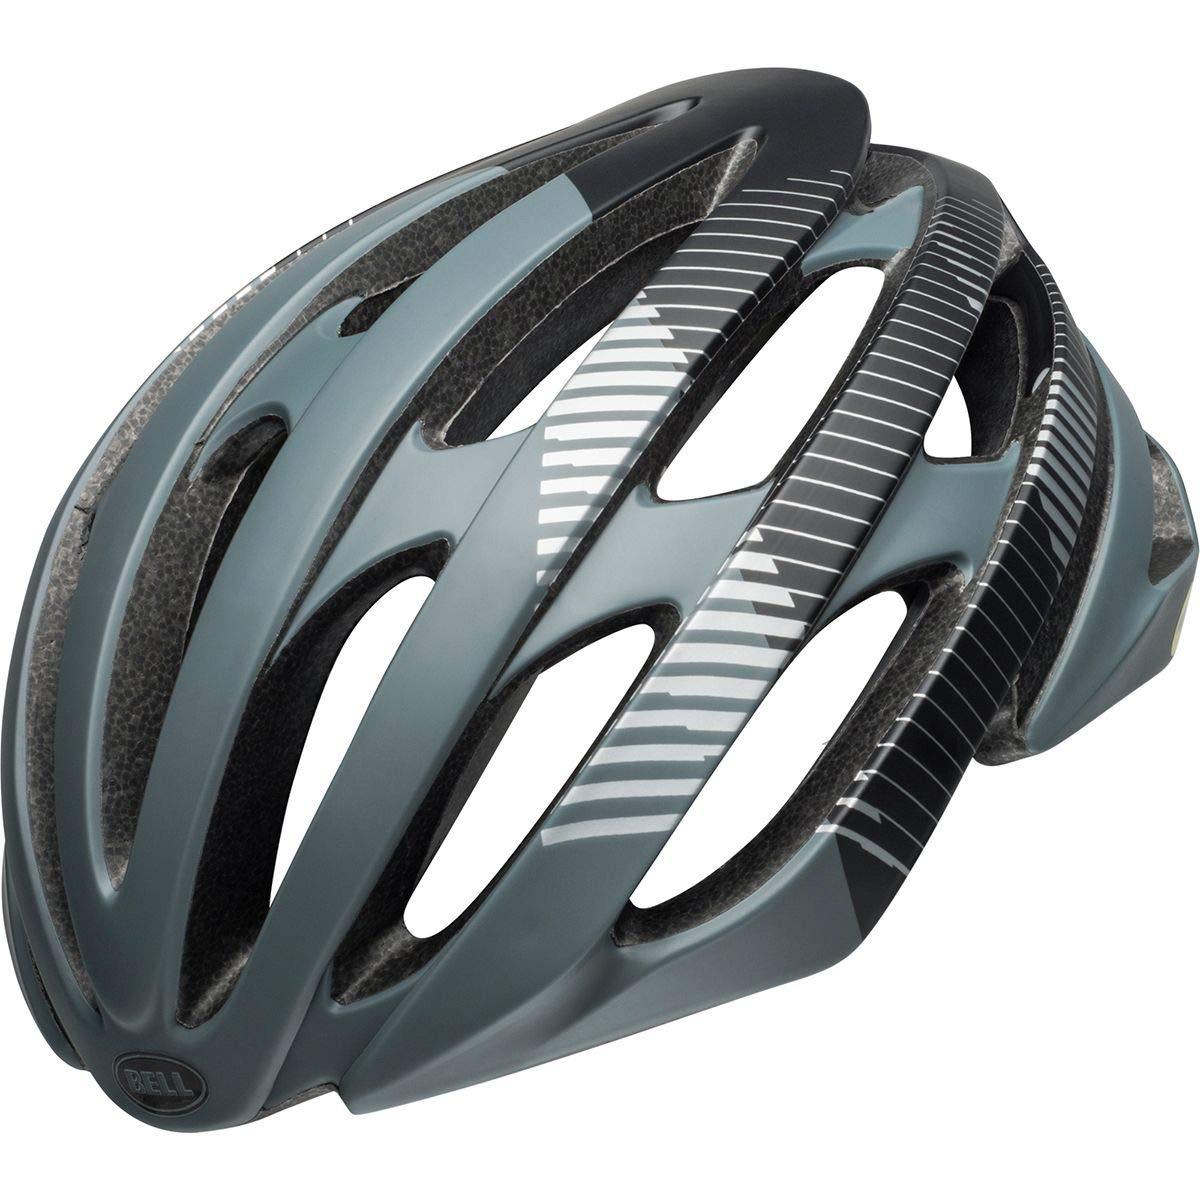 Bell Stratus MIPS Helmet Bluster Matte Black/Coal/Silver, S